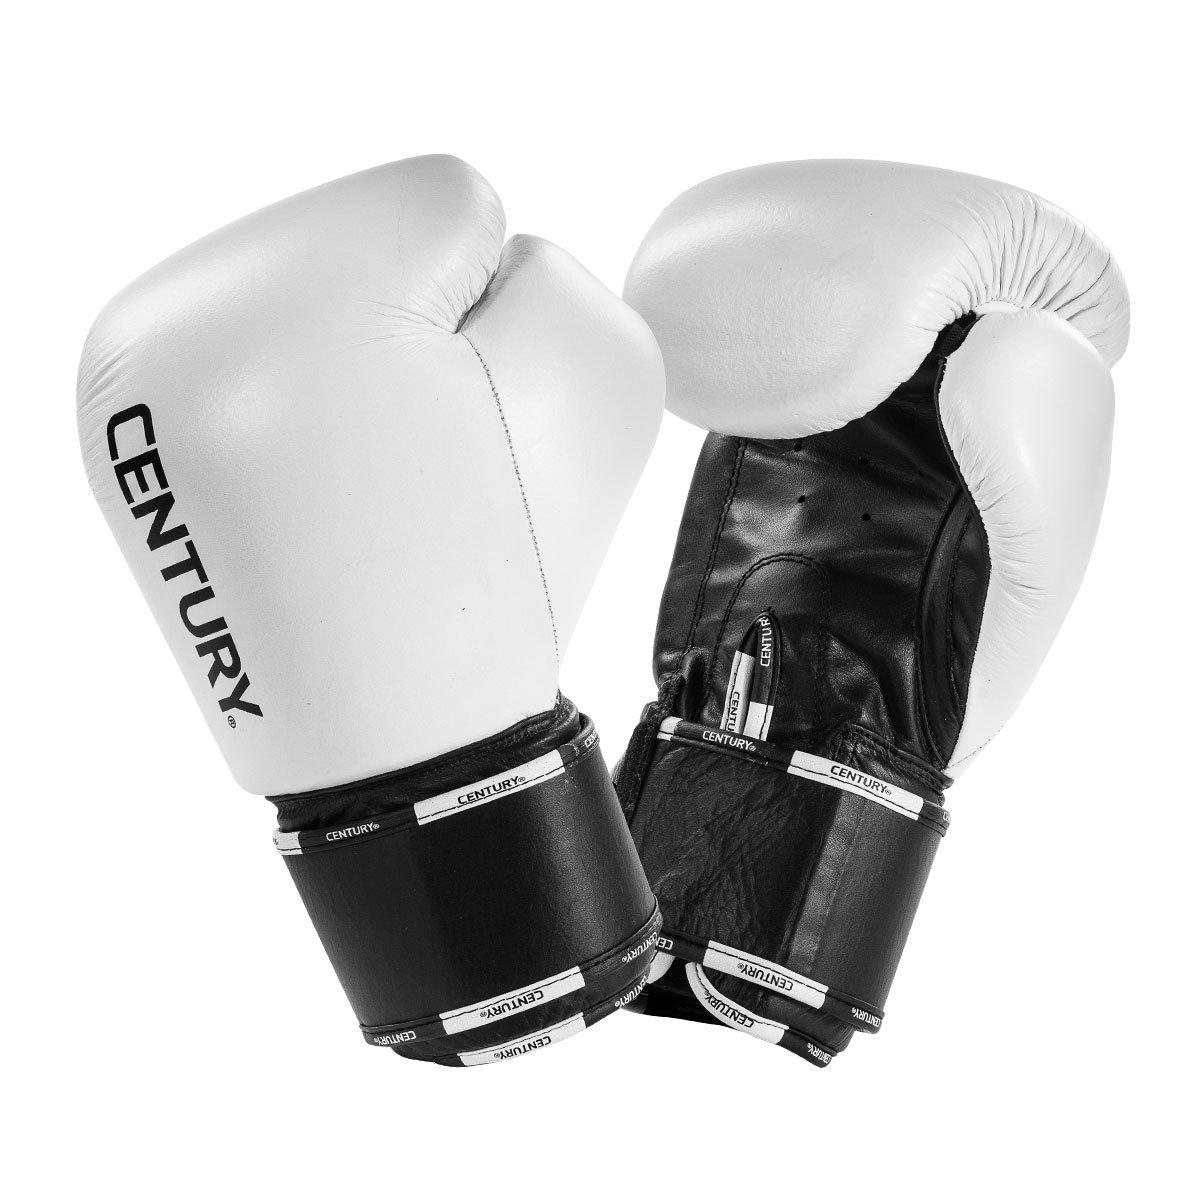 Century® Creed Heavy Bag Gloves